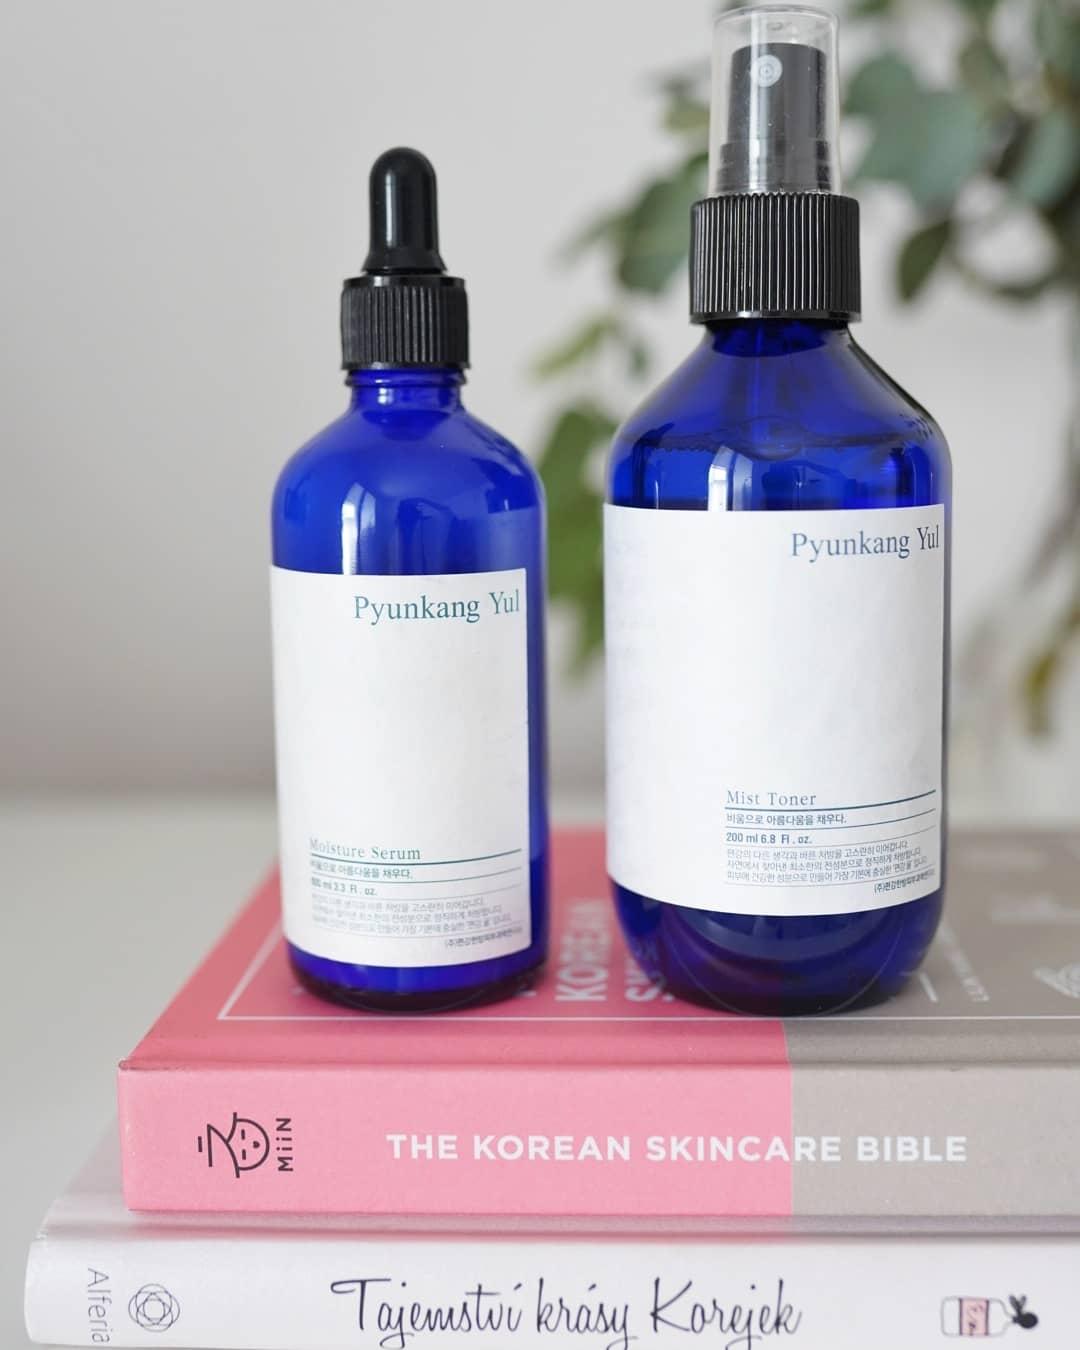 kórejská kozmetika pyunkang yul